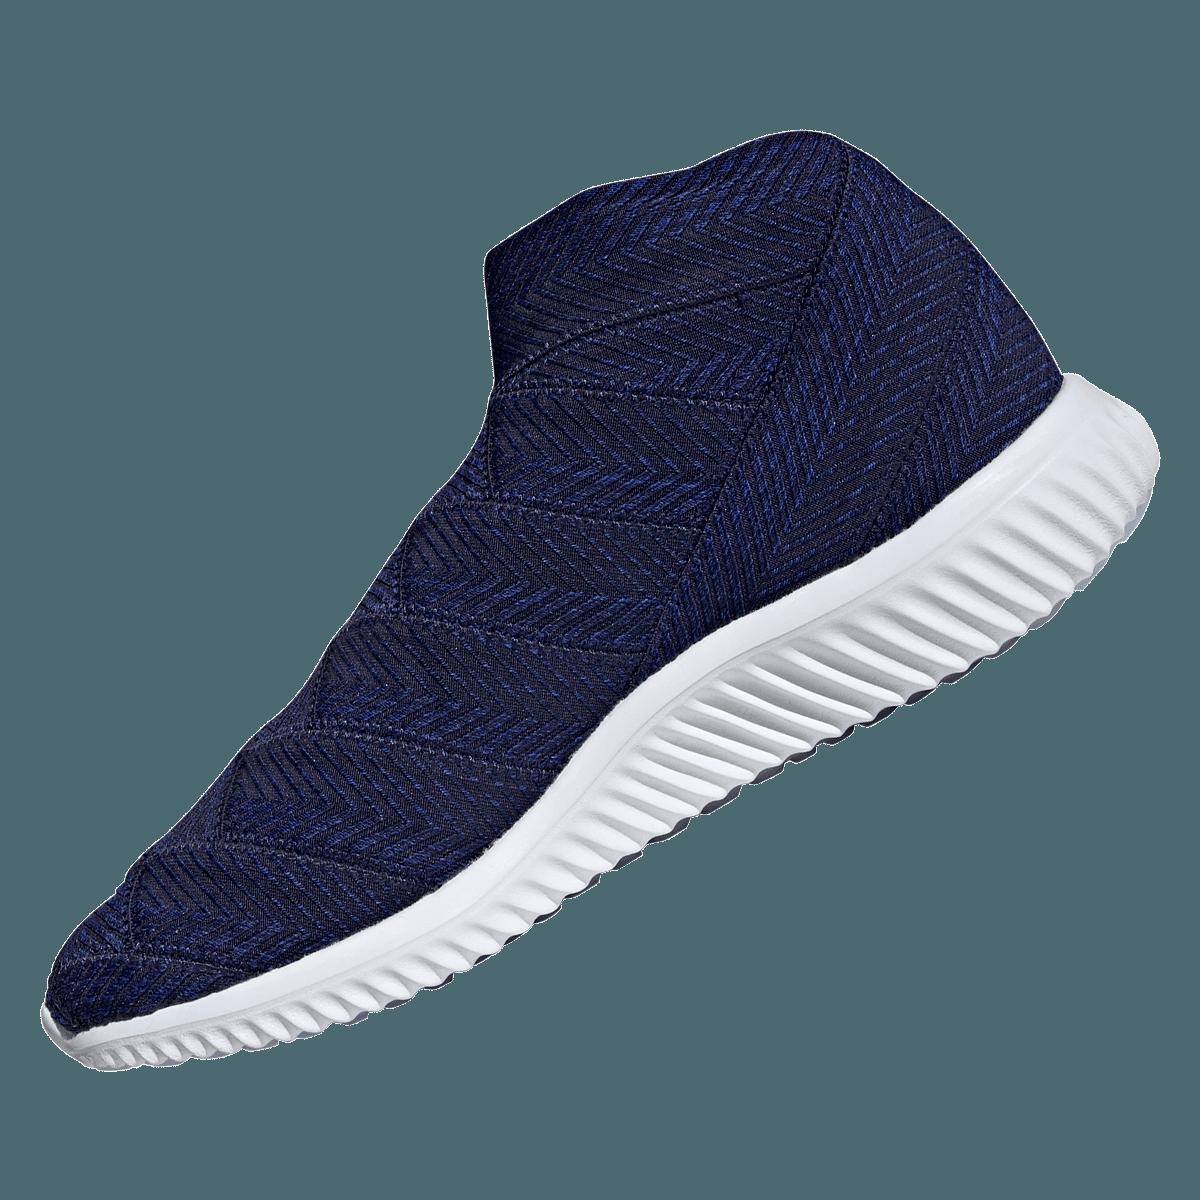 Nemeziz Dunkelblaublau Adidas 1 18 Tr Schuh 34ARqj5L